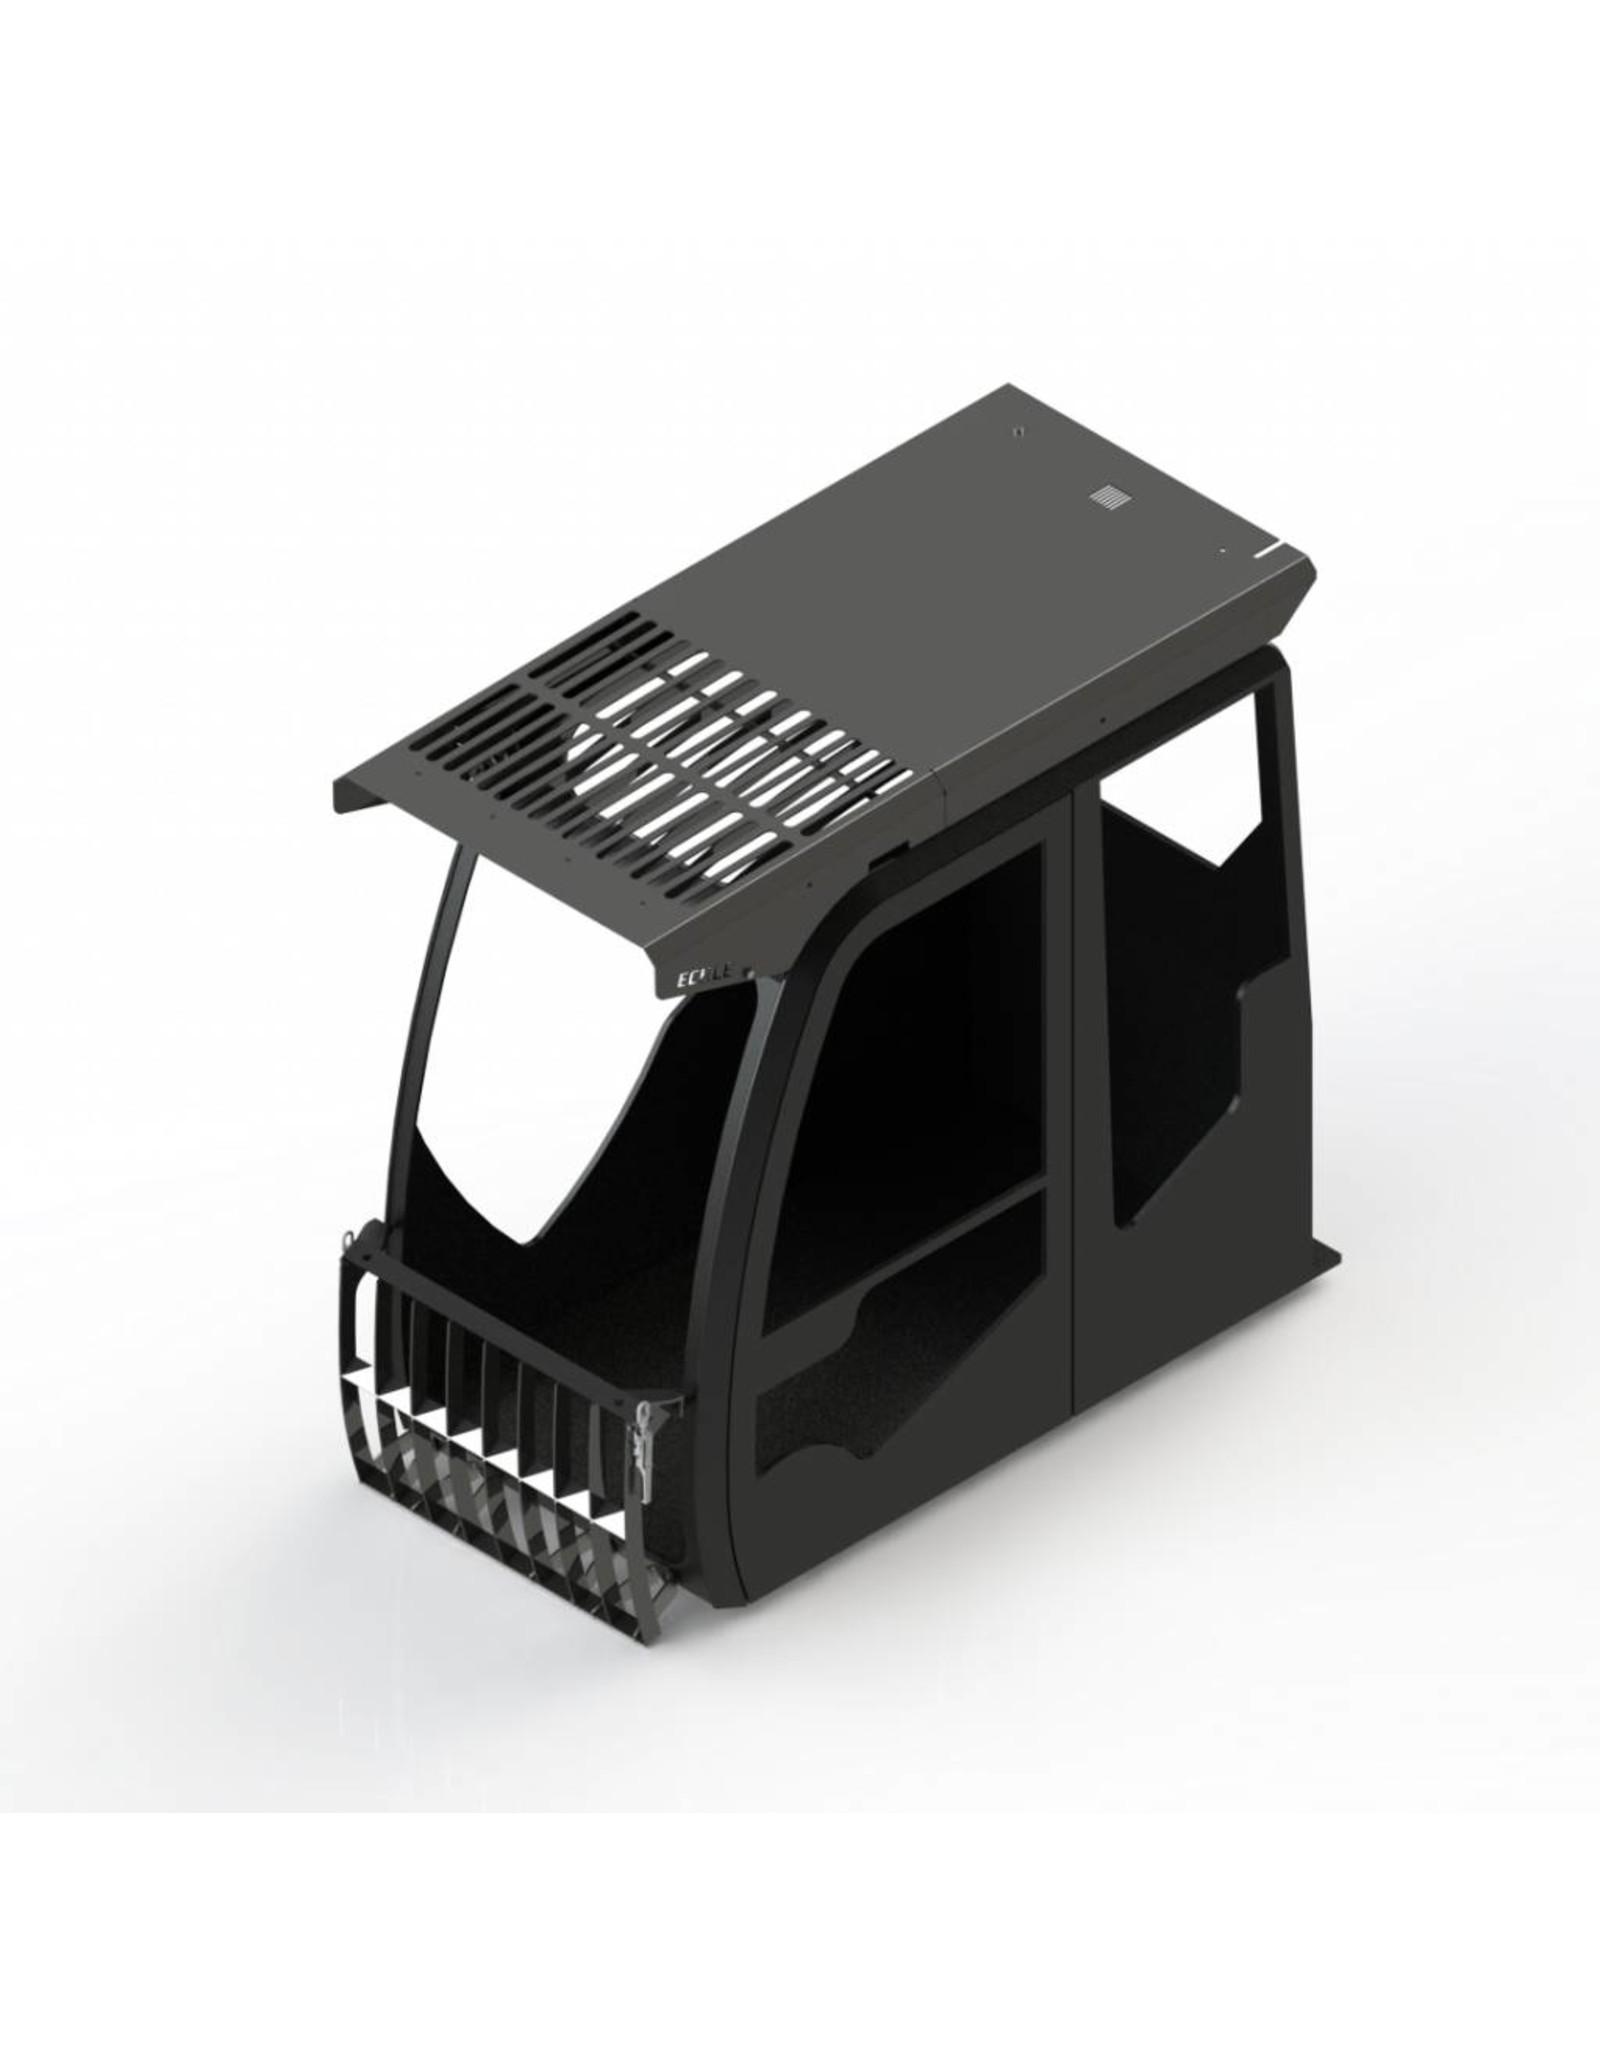 Echle Hartstahl GmbH FOPS für Hyundai HW180